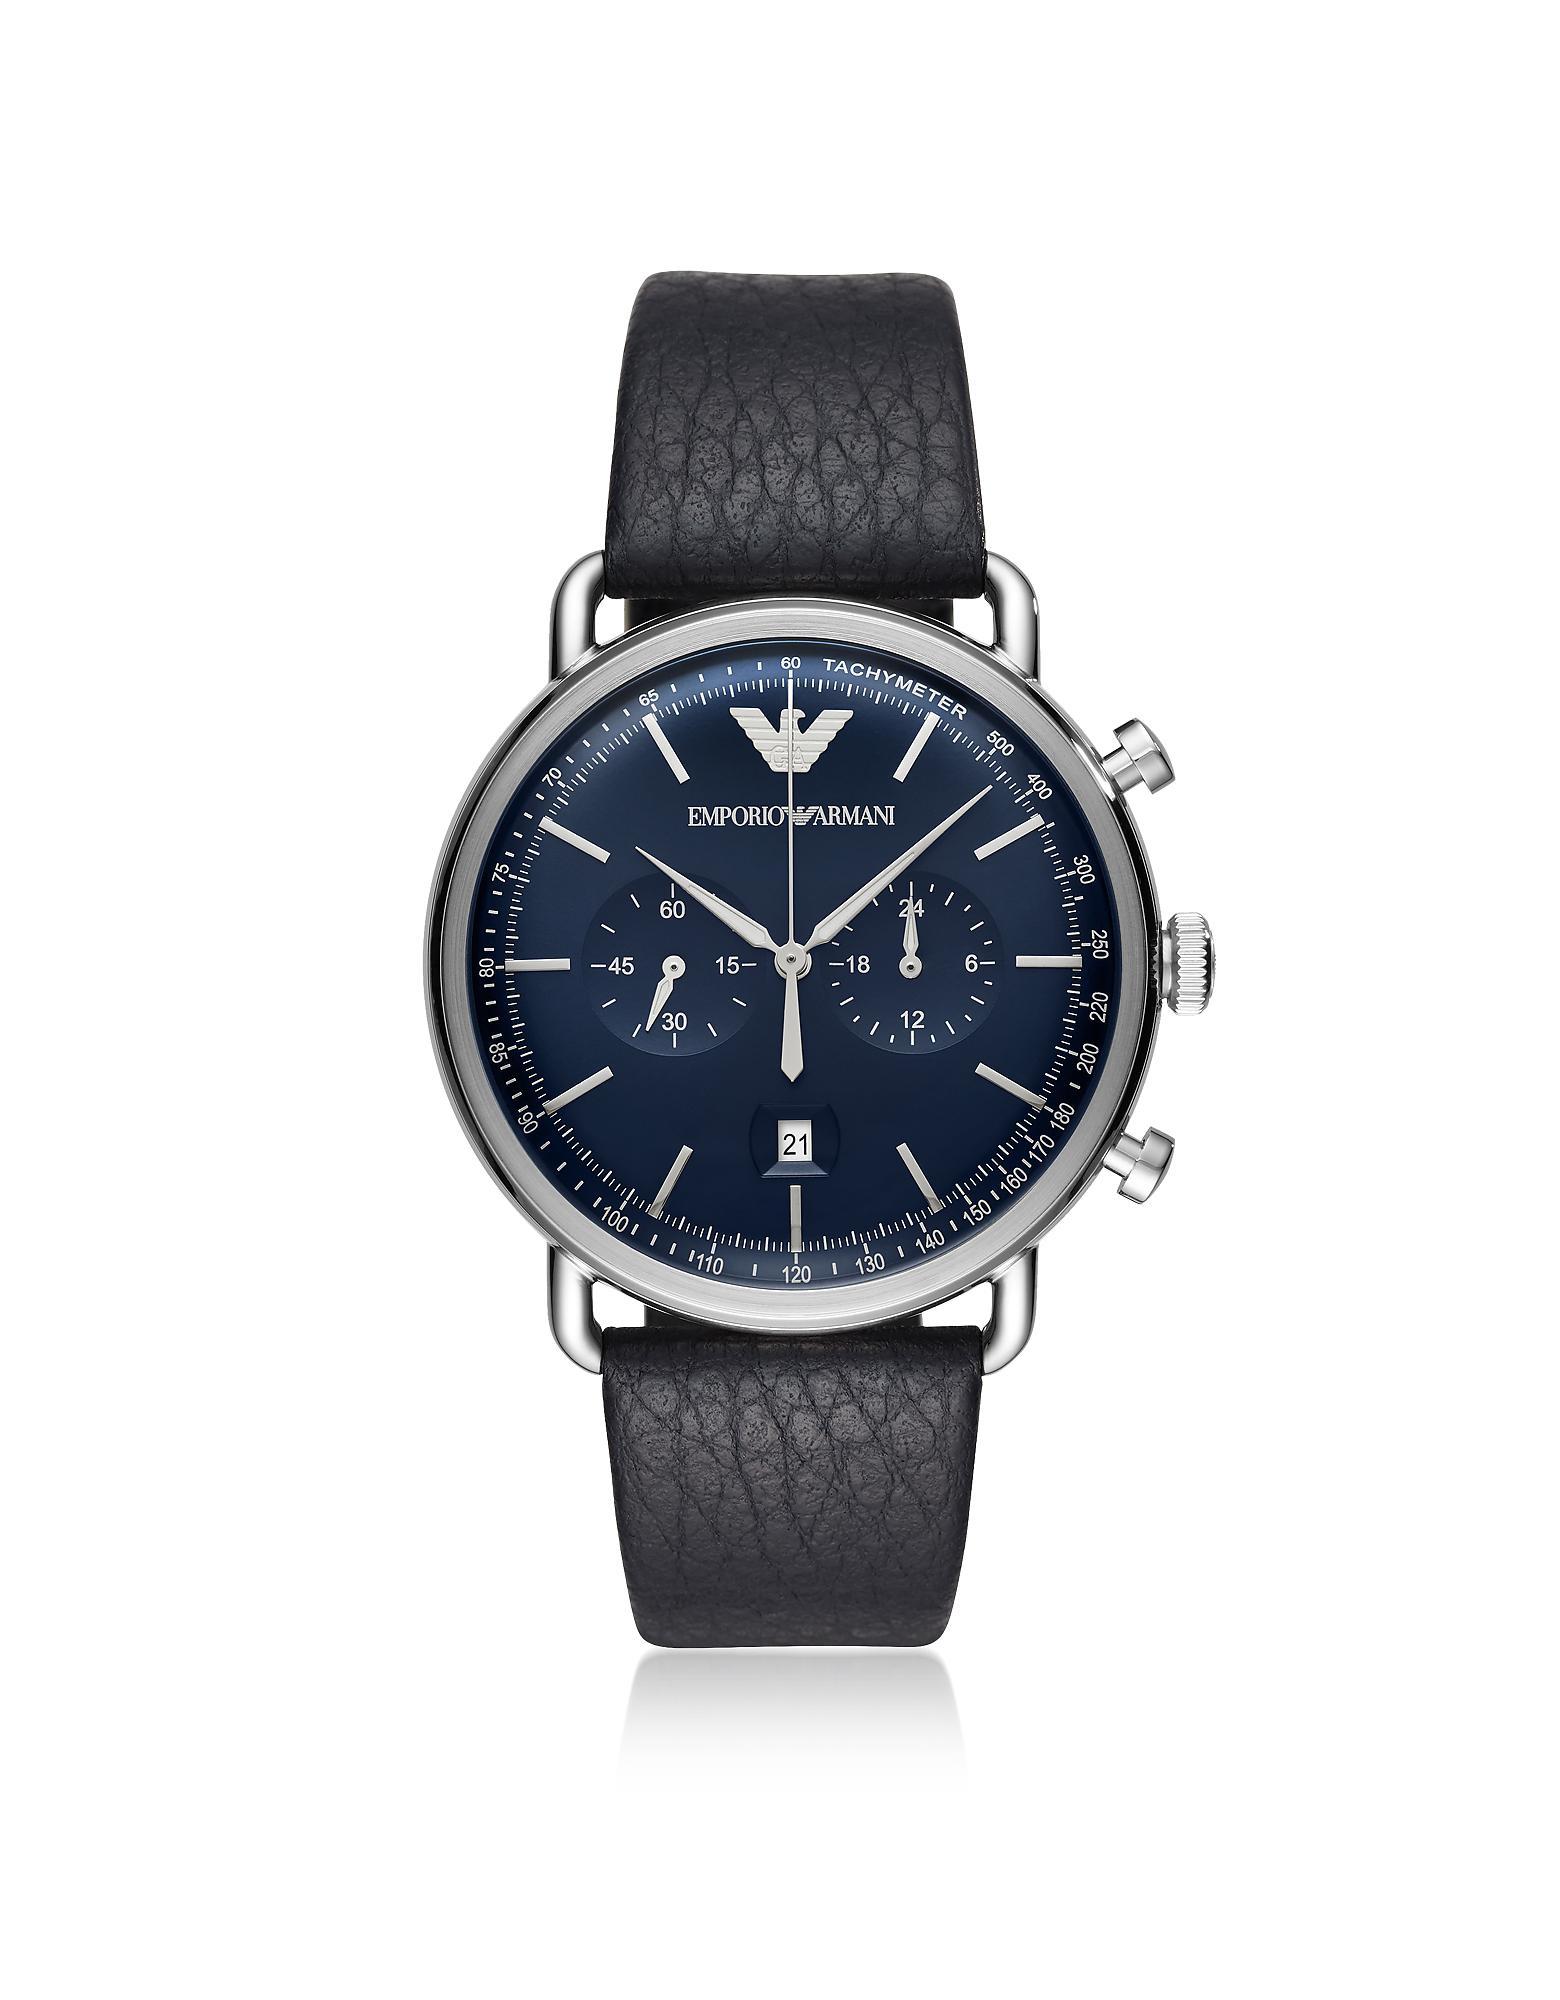 29ac466eeae Lyst - Emporio Armani Men s Dress Watch in Metallic for Men